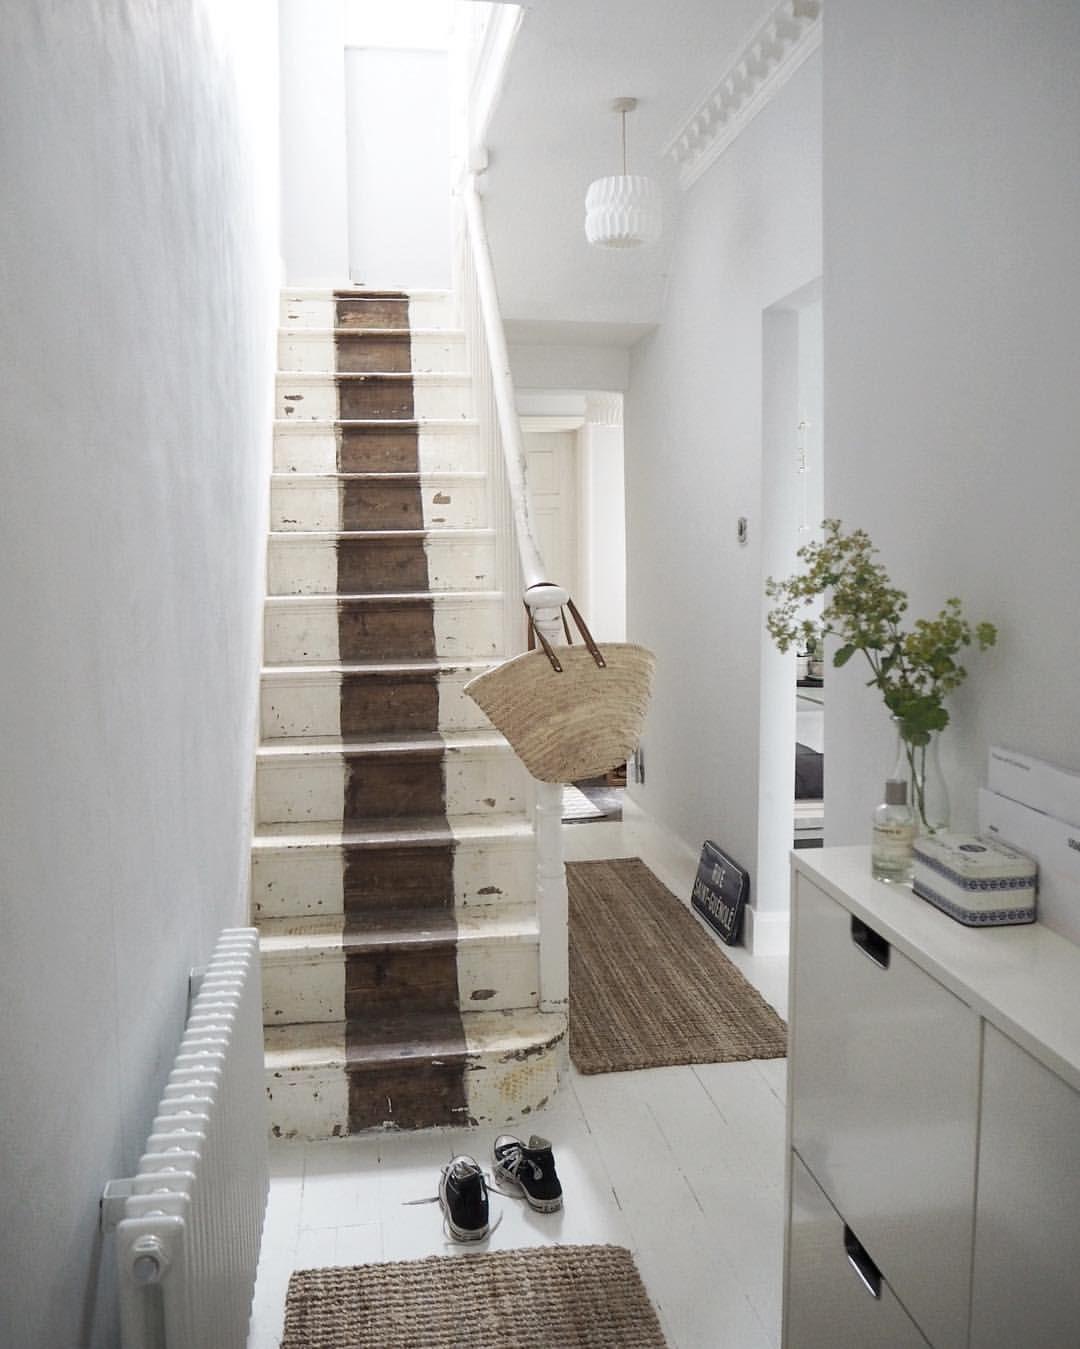 Stairways lighting ideas led light strips on stairway diyhomedecor dreamhouse livingroomideas stairways stair stairs